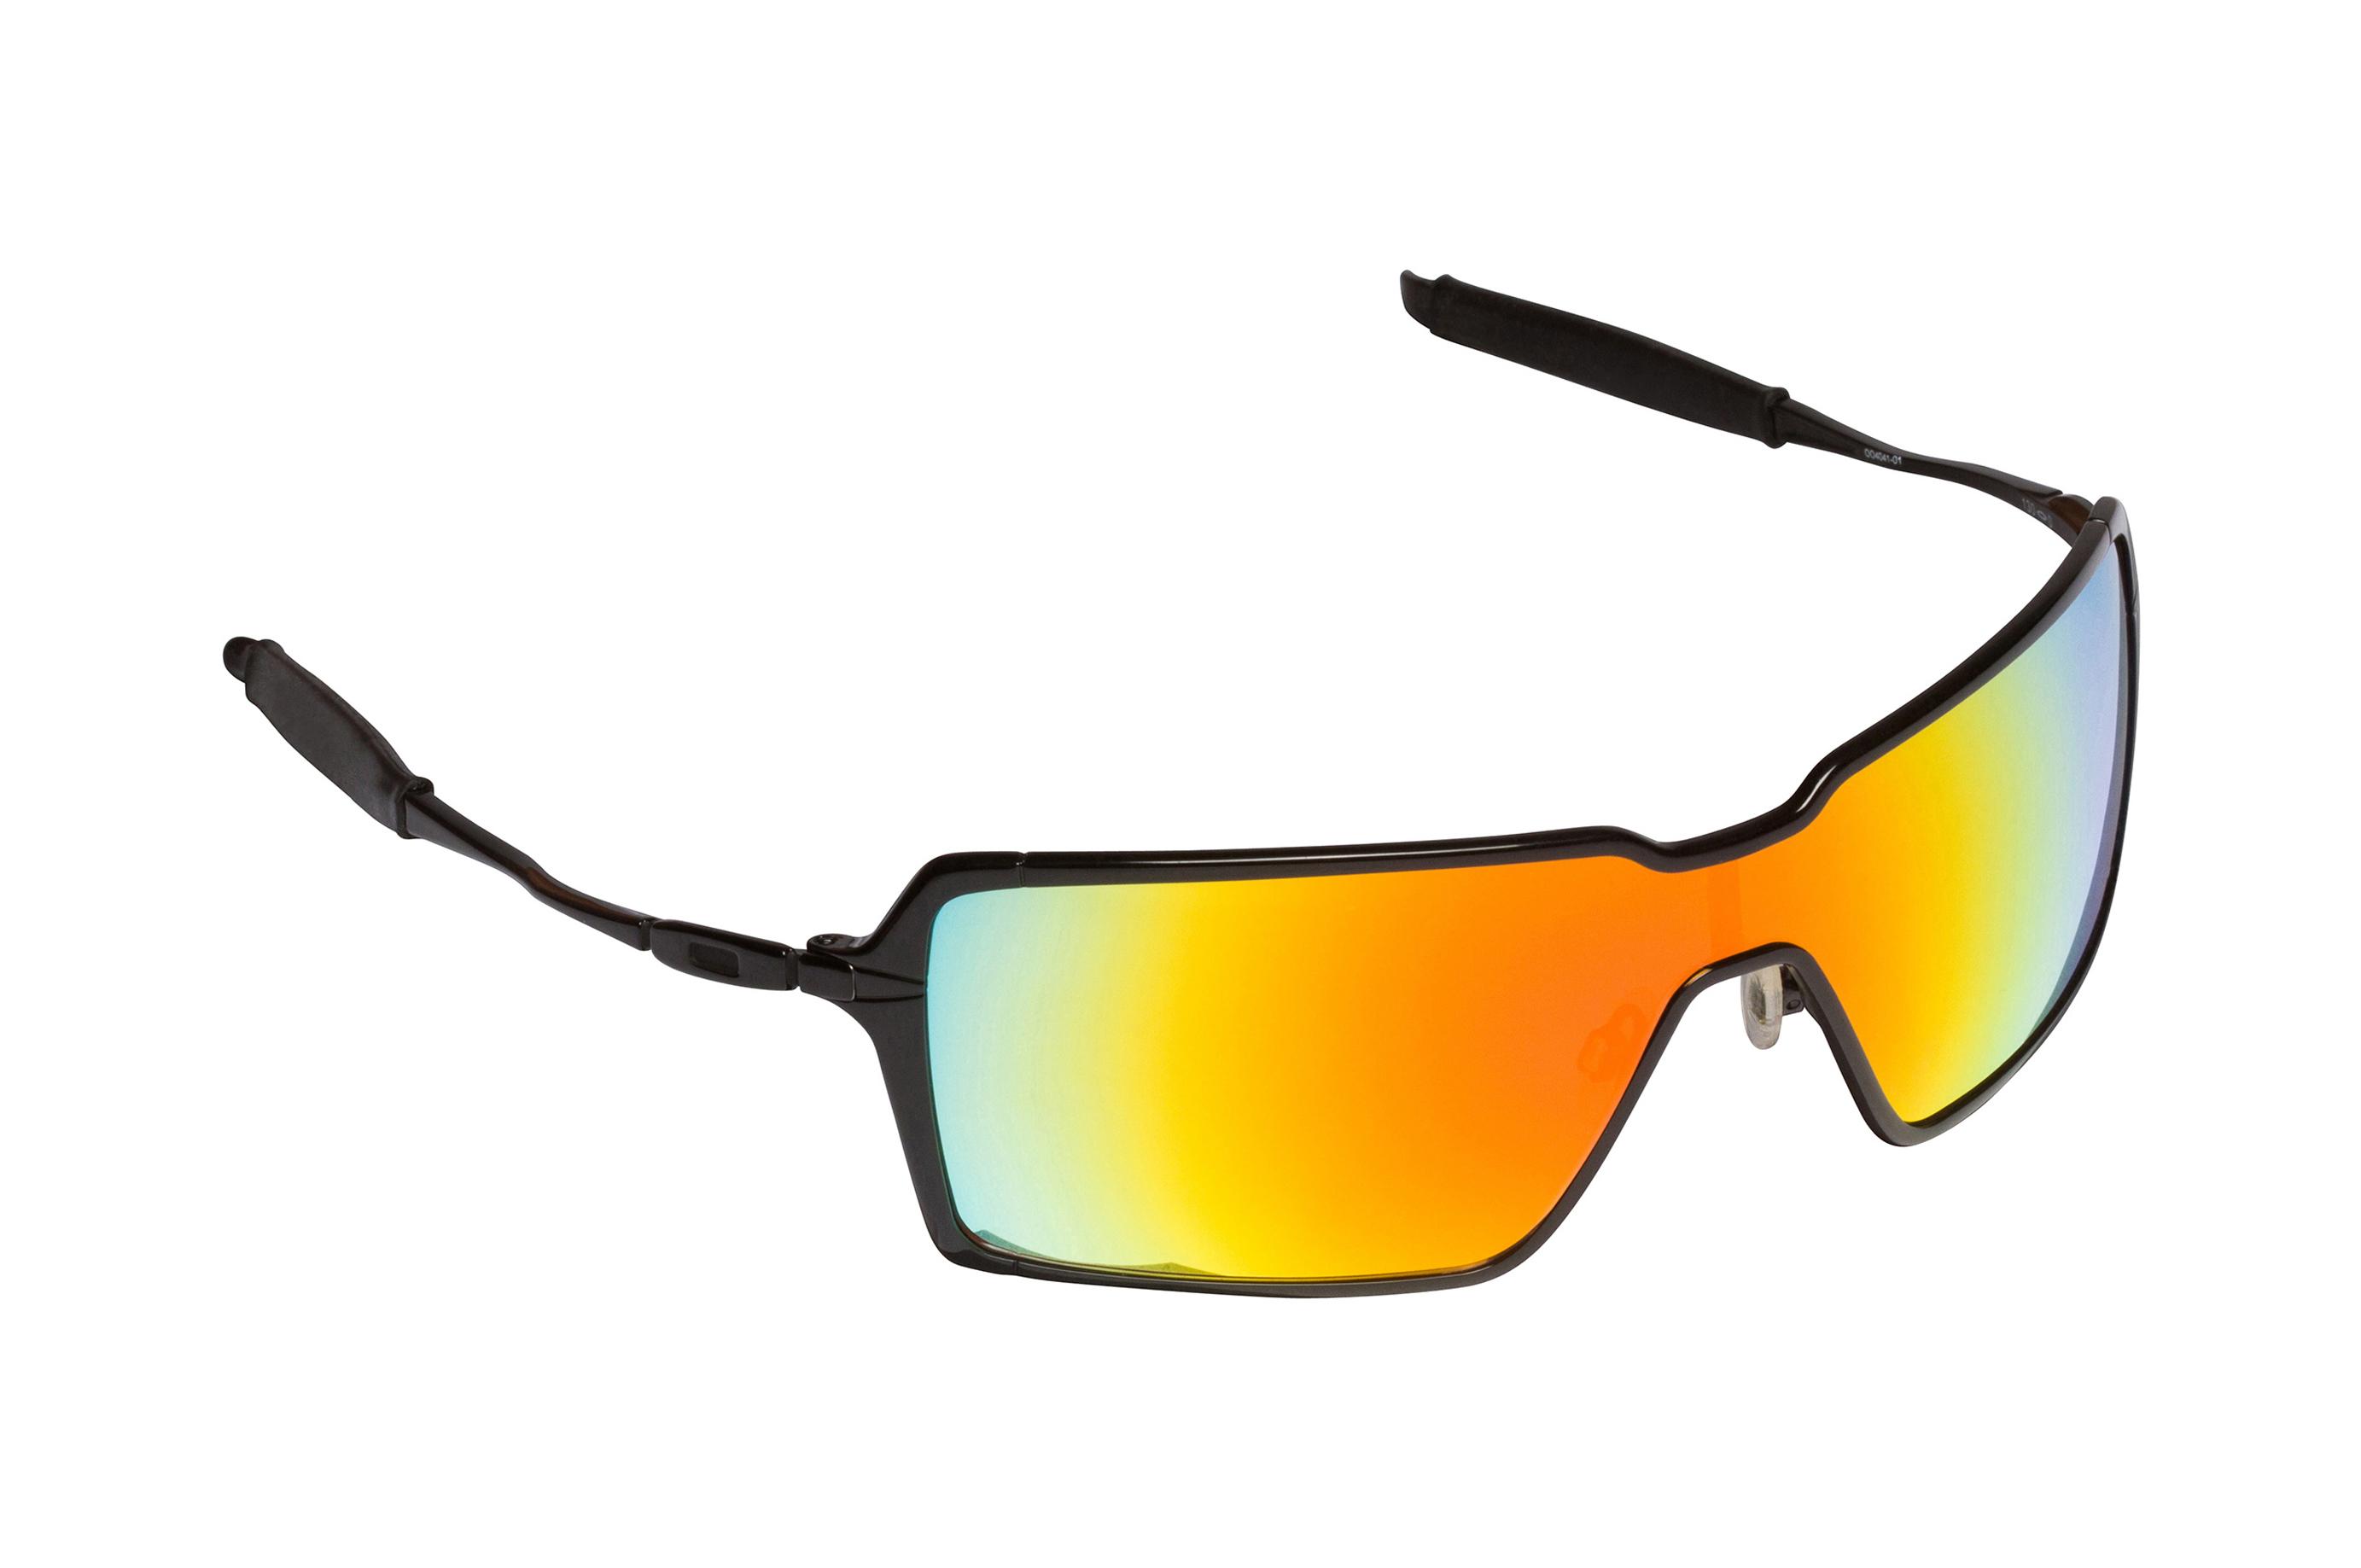 Sunglasses brands